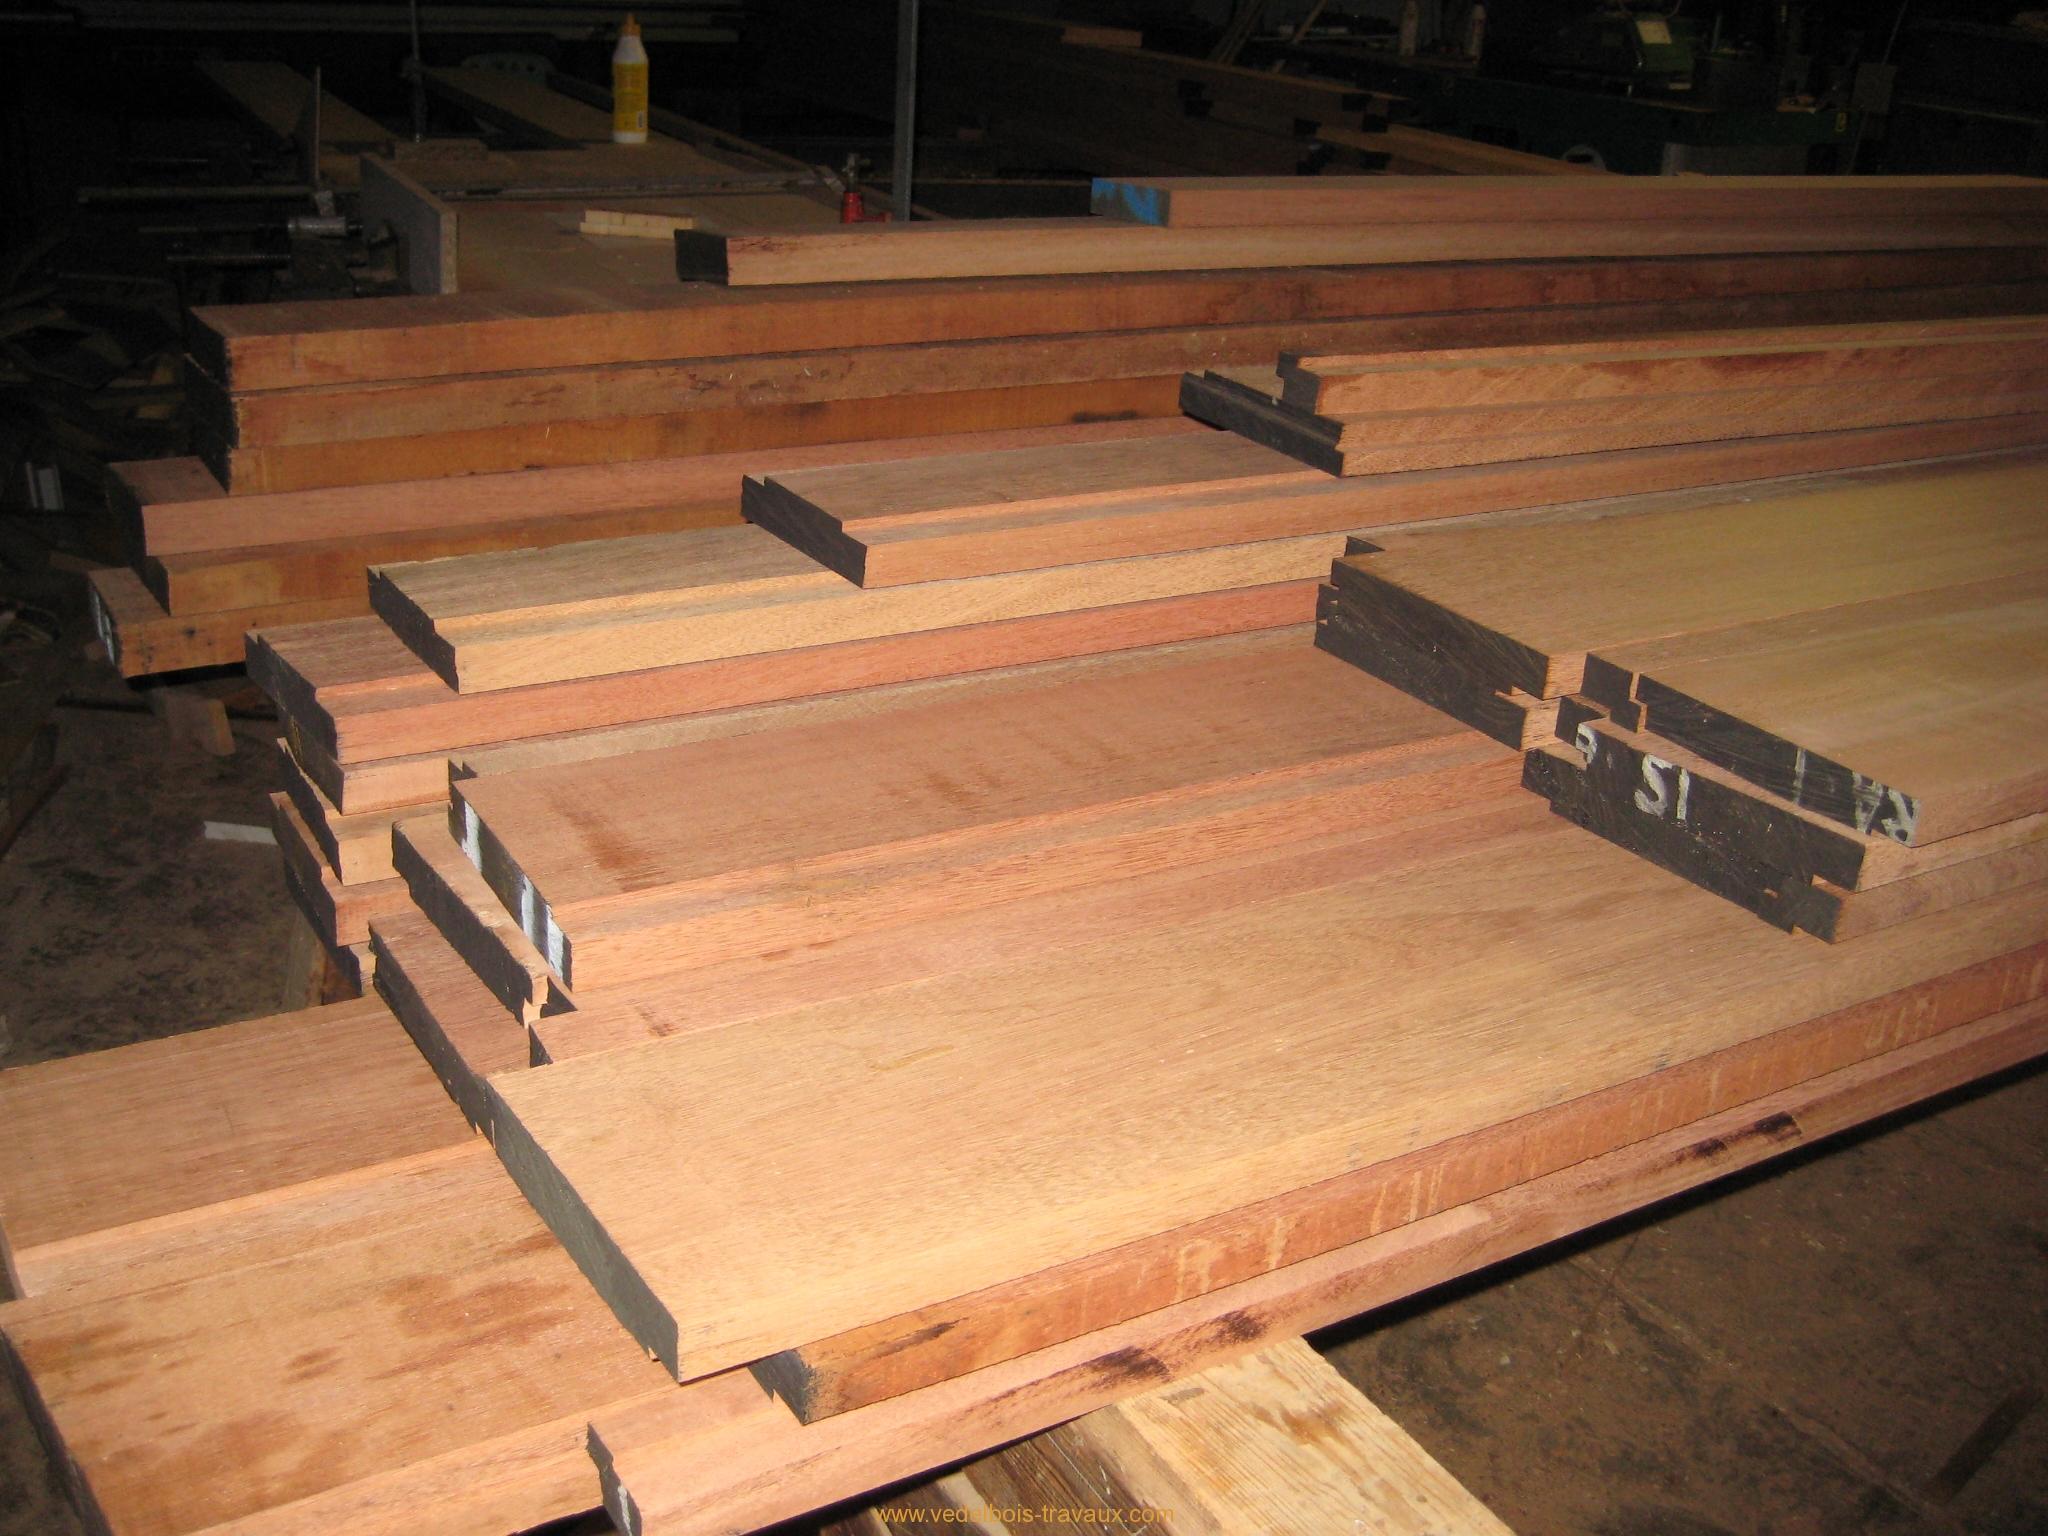 plancher camion sur mesure archives sarl vedel. Black Bedroom Furniture Sets. Home Design Ideas